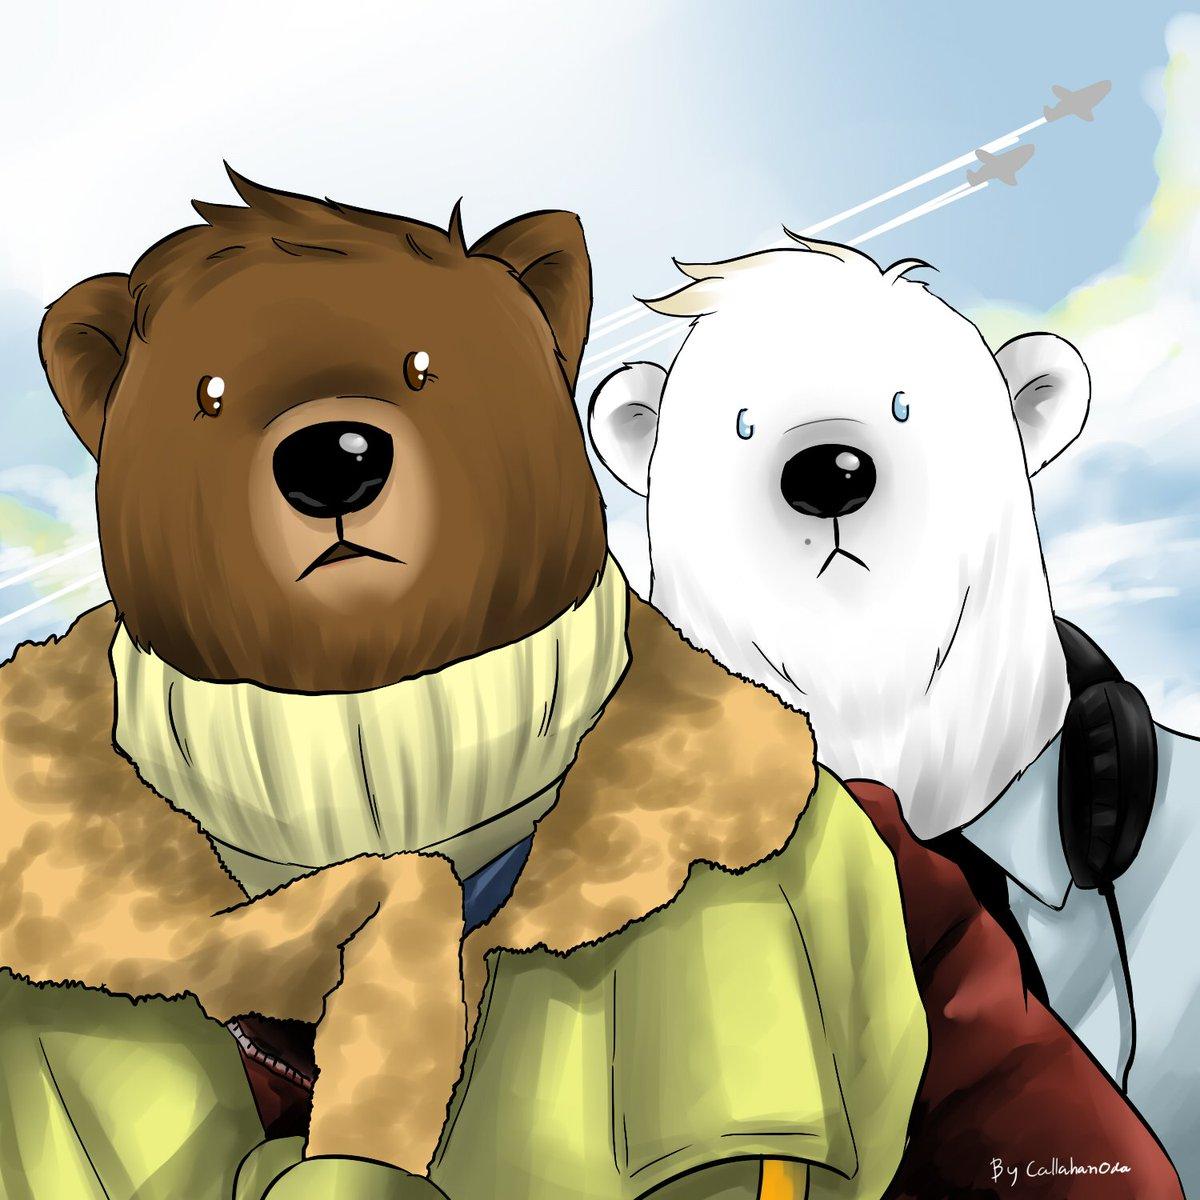 @JALowden You look like a Polar bear.  #JackLowden #TomHardy #Dunkirk #DNK48<br>http://pic.twitter.com/69D48mDWNR